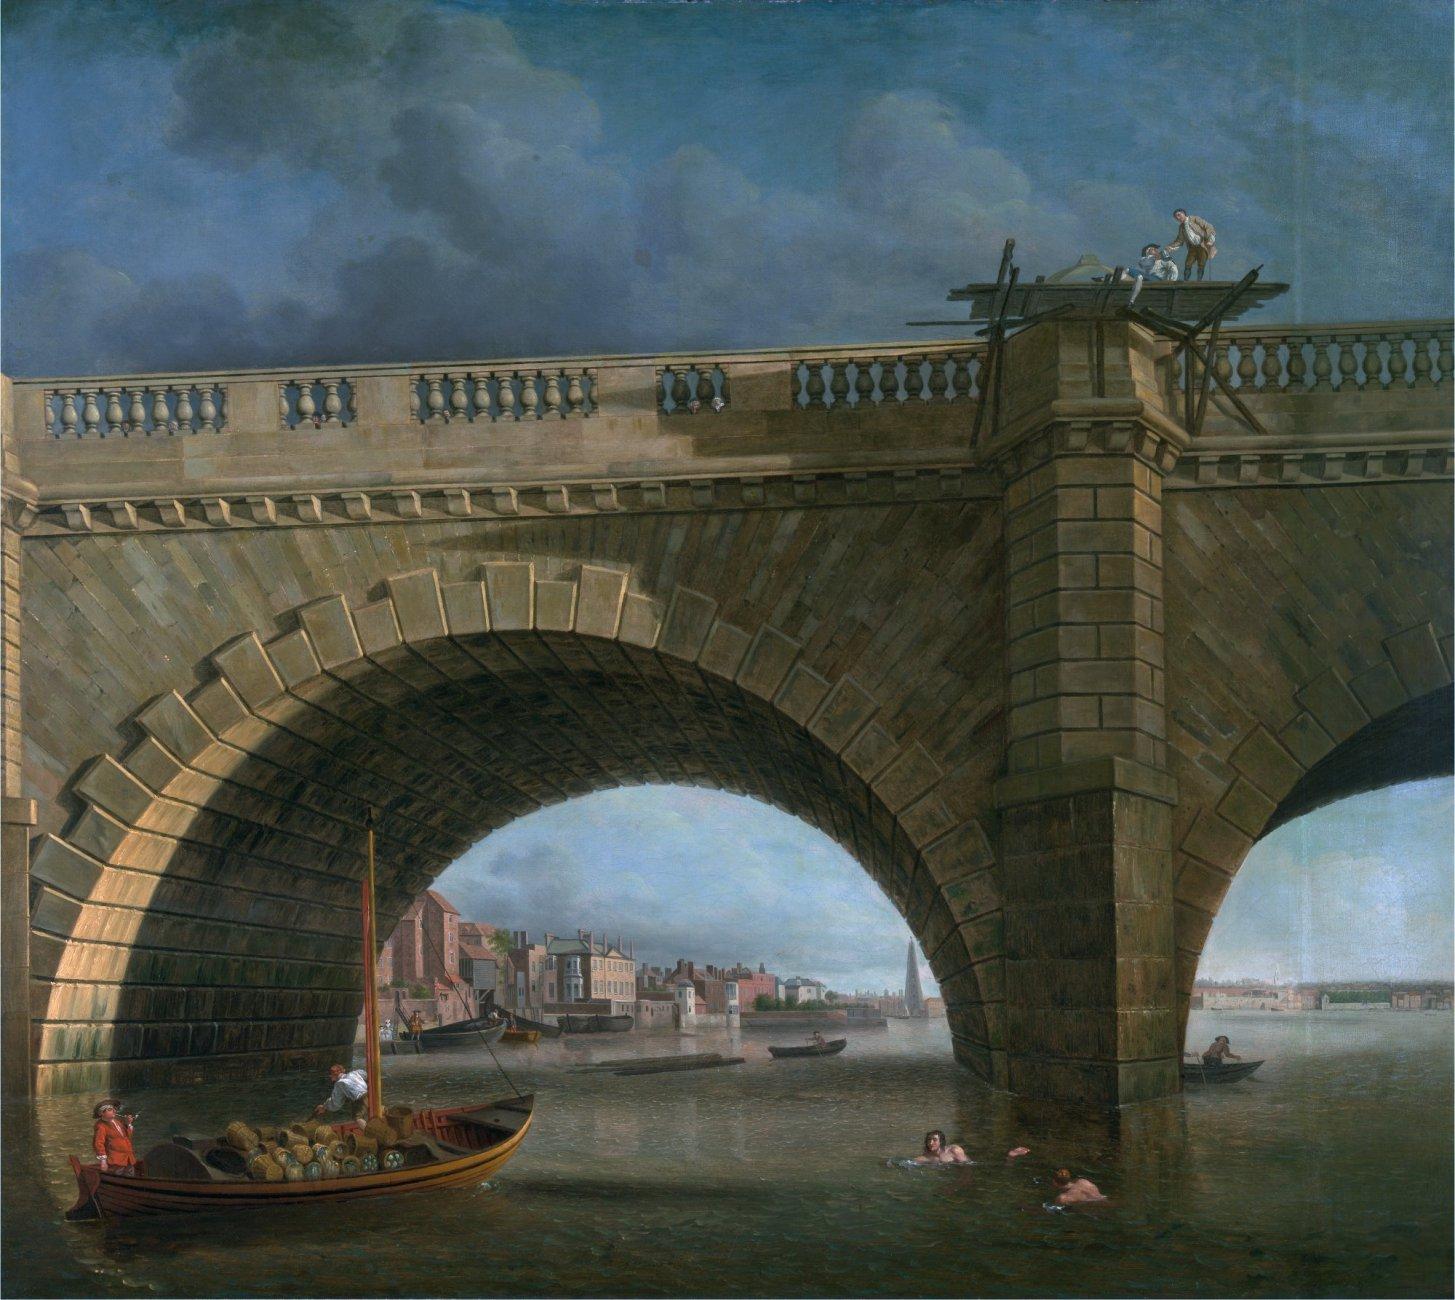 siftingthepast_arches-of-westminster-bridge_samuel-scott1702-1772_ca-1750.jpg